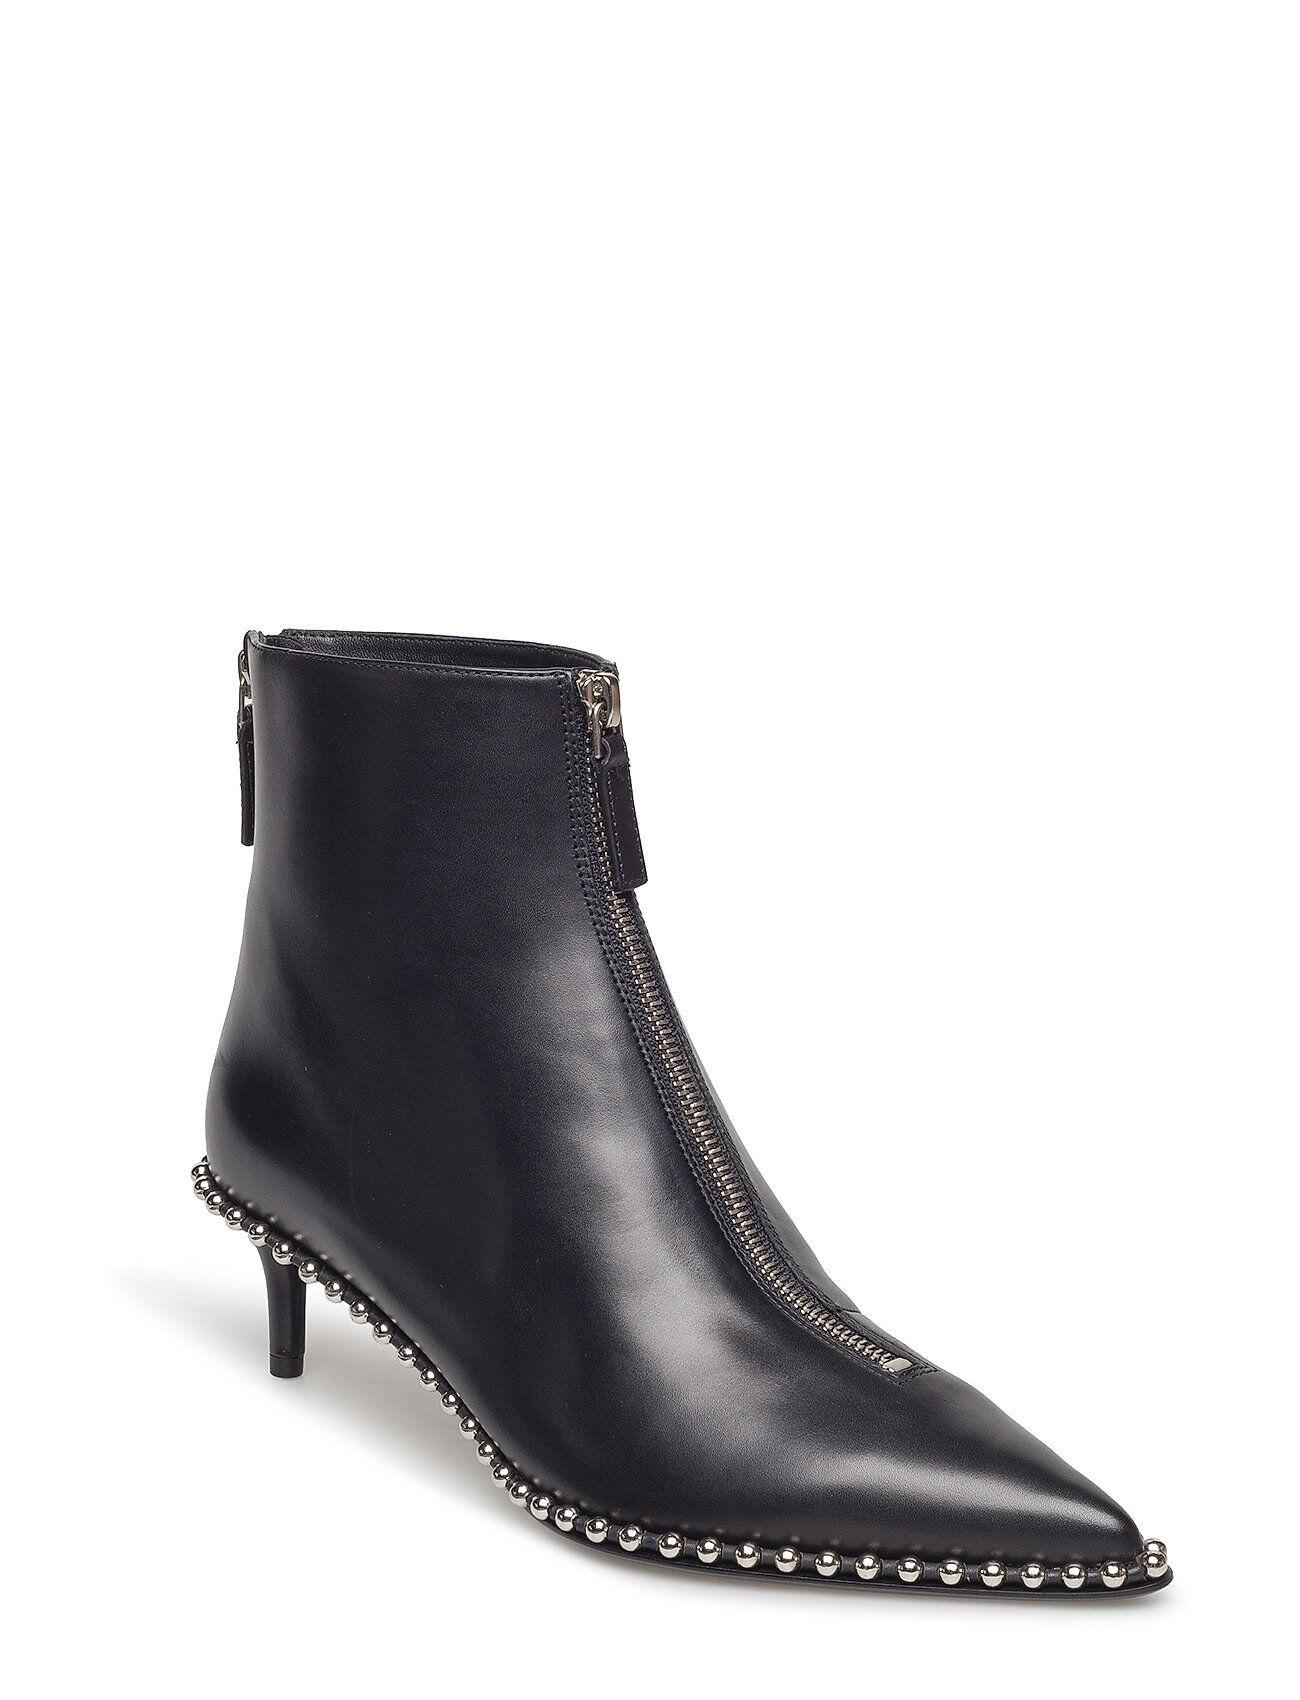 Alexander Wang Eri Low Black Smooth Leather